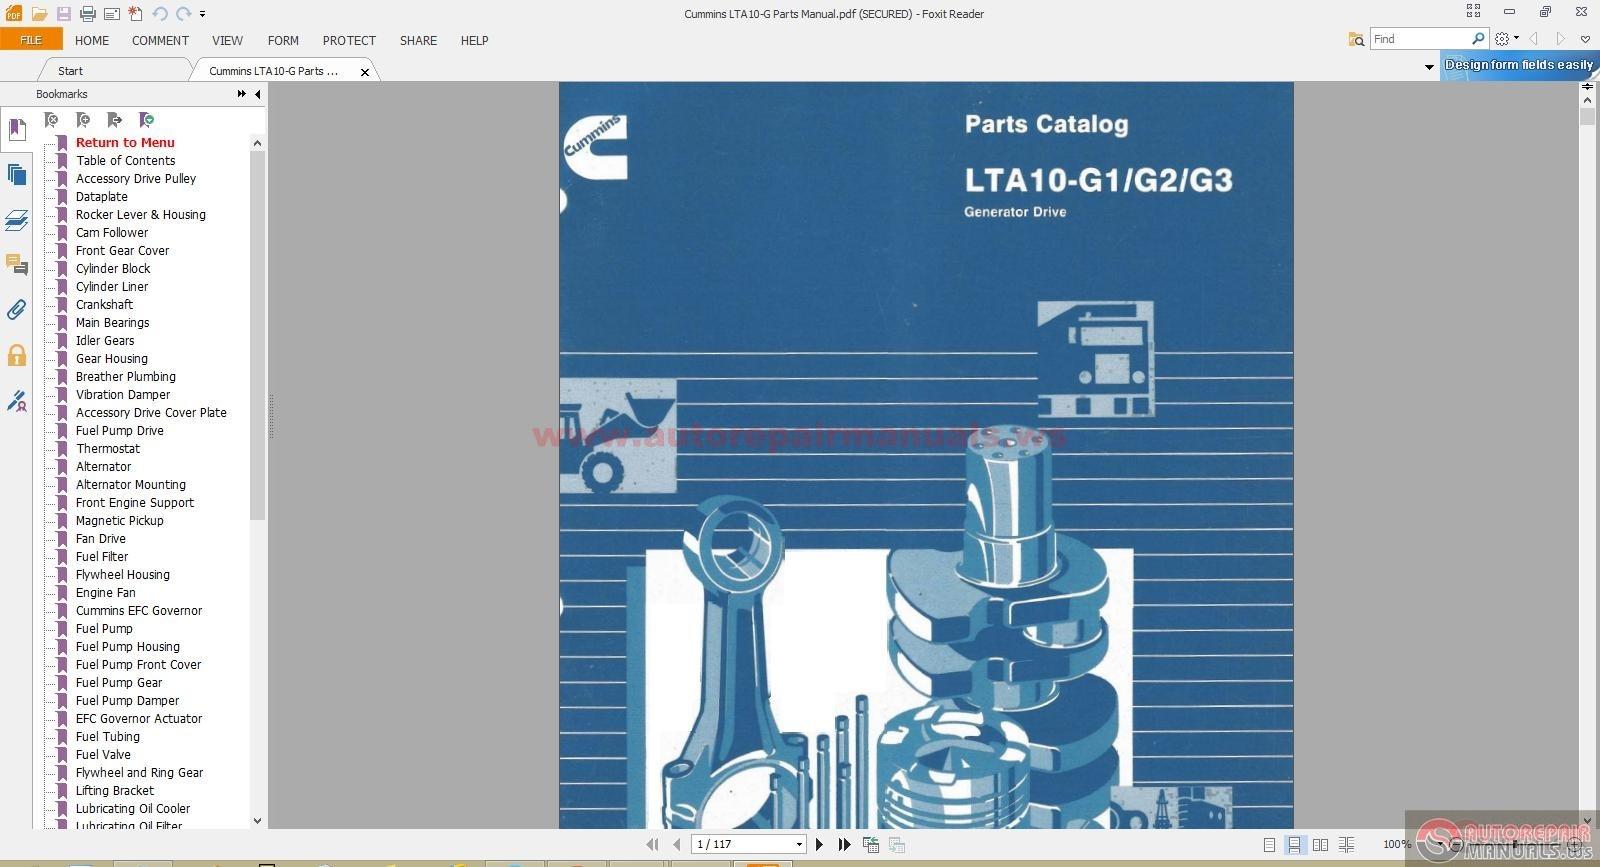 Cummins Lta G Parts Manualizp on Generator Wiring Diagram